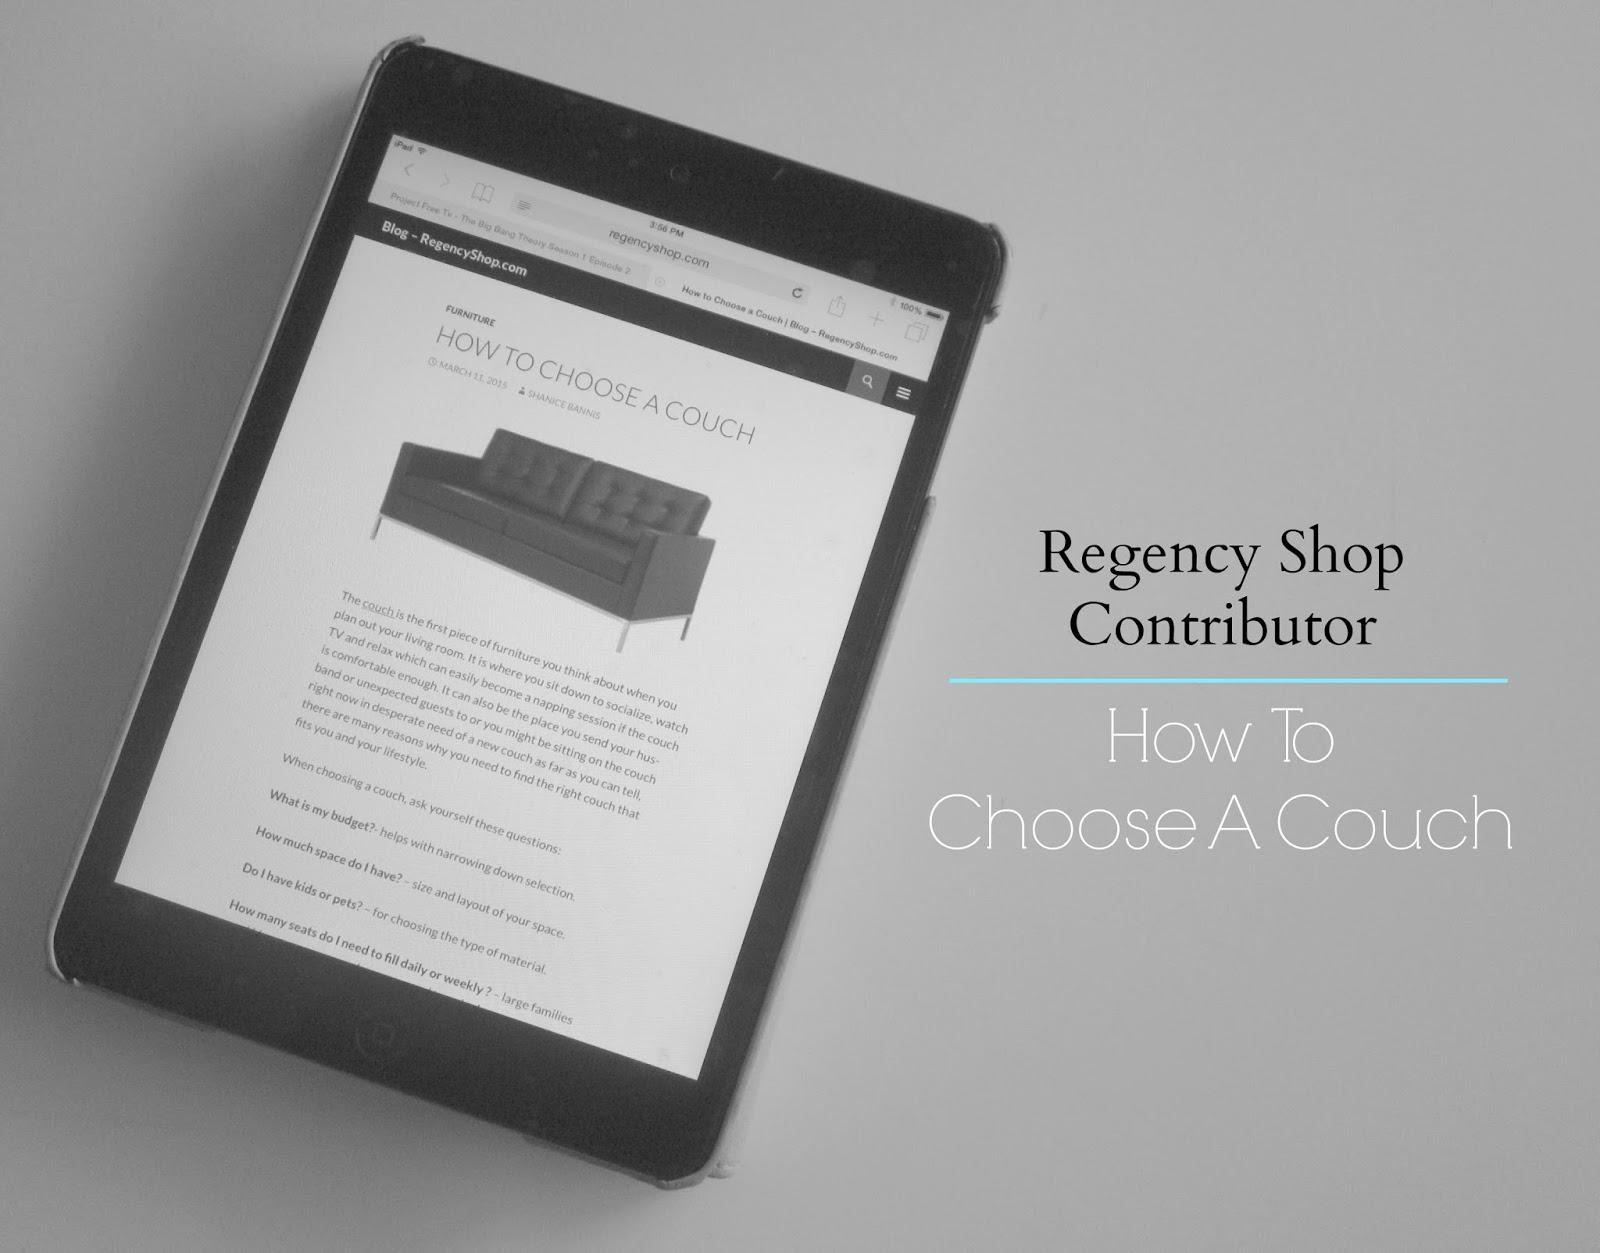 regency shop contributor post